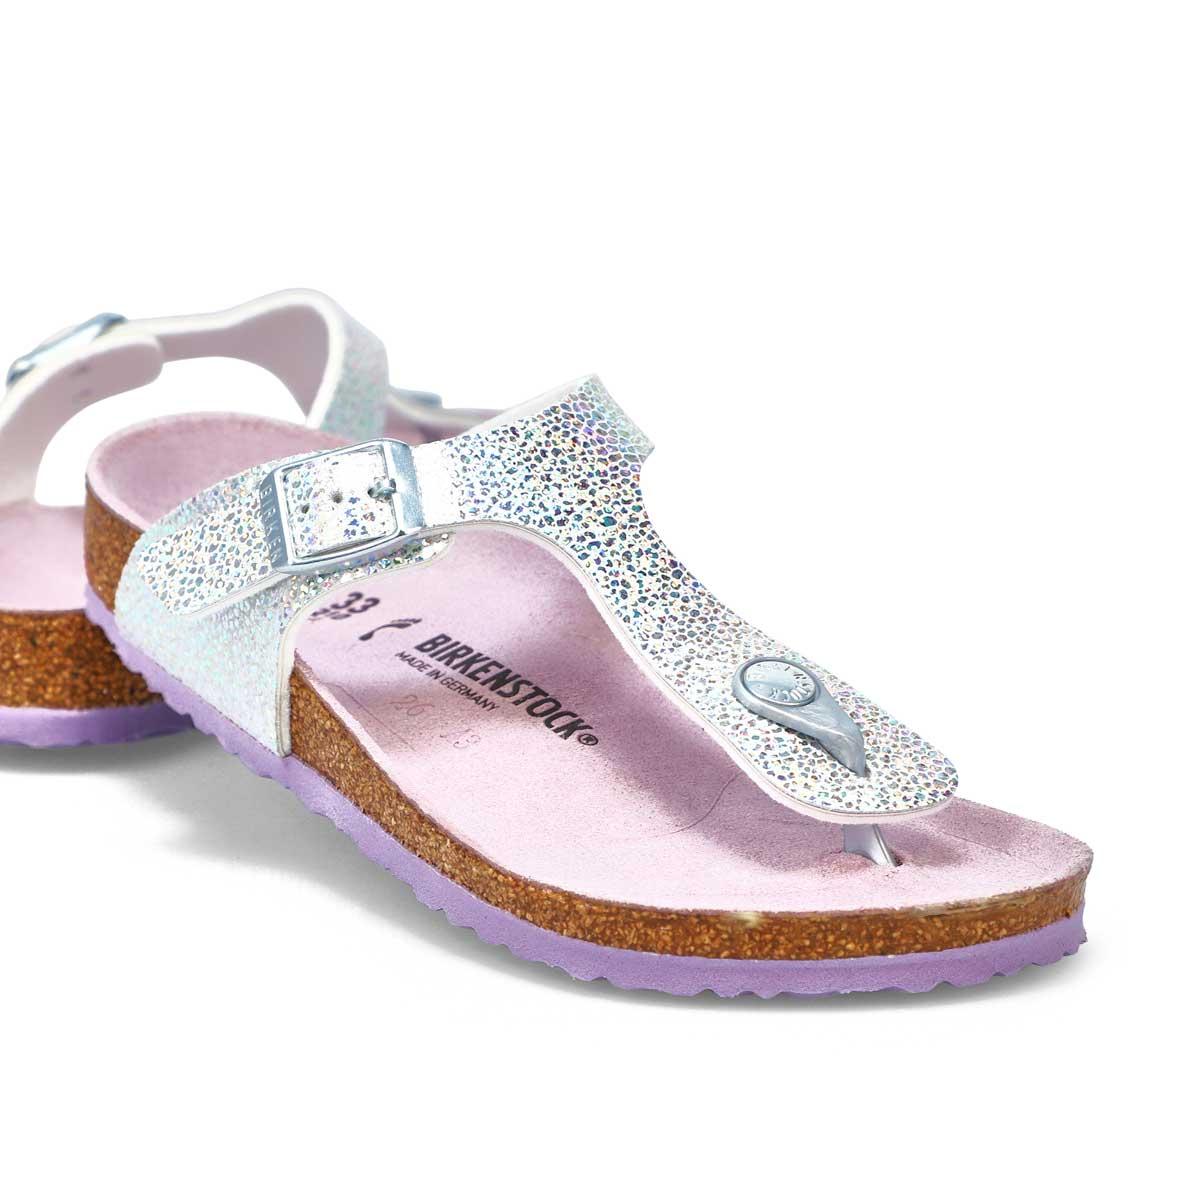 Girls' Gizeh Narrow Sandal - Disco Ball